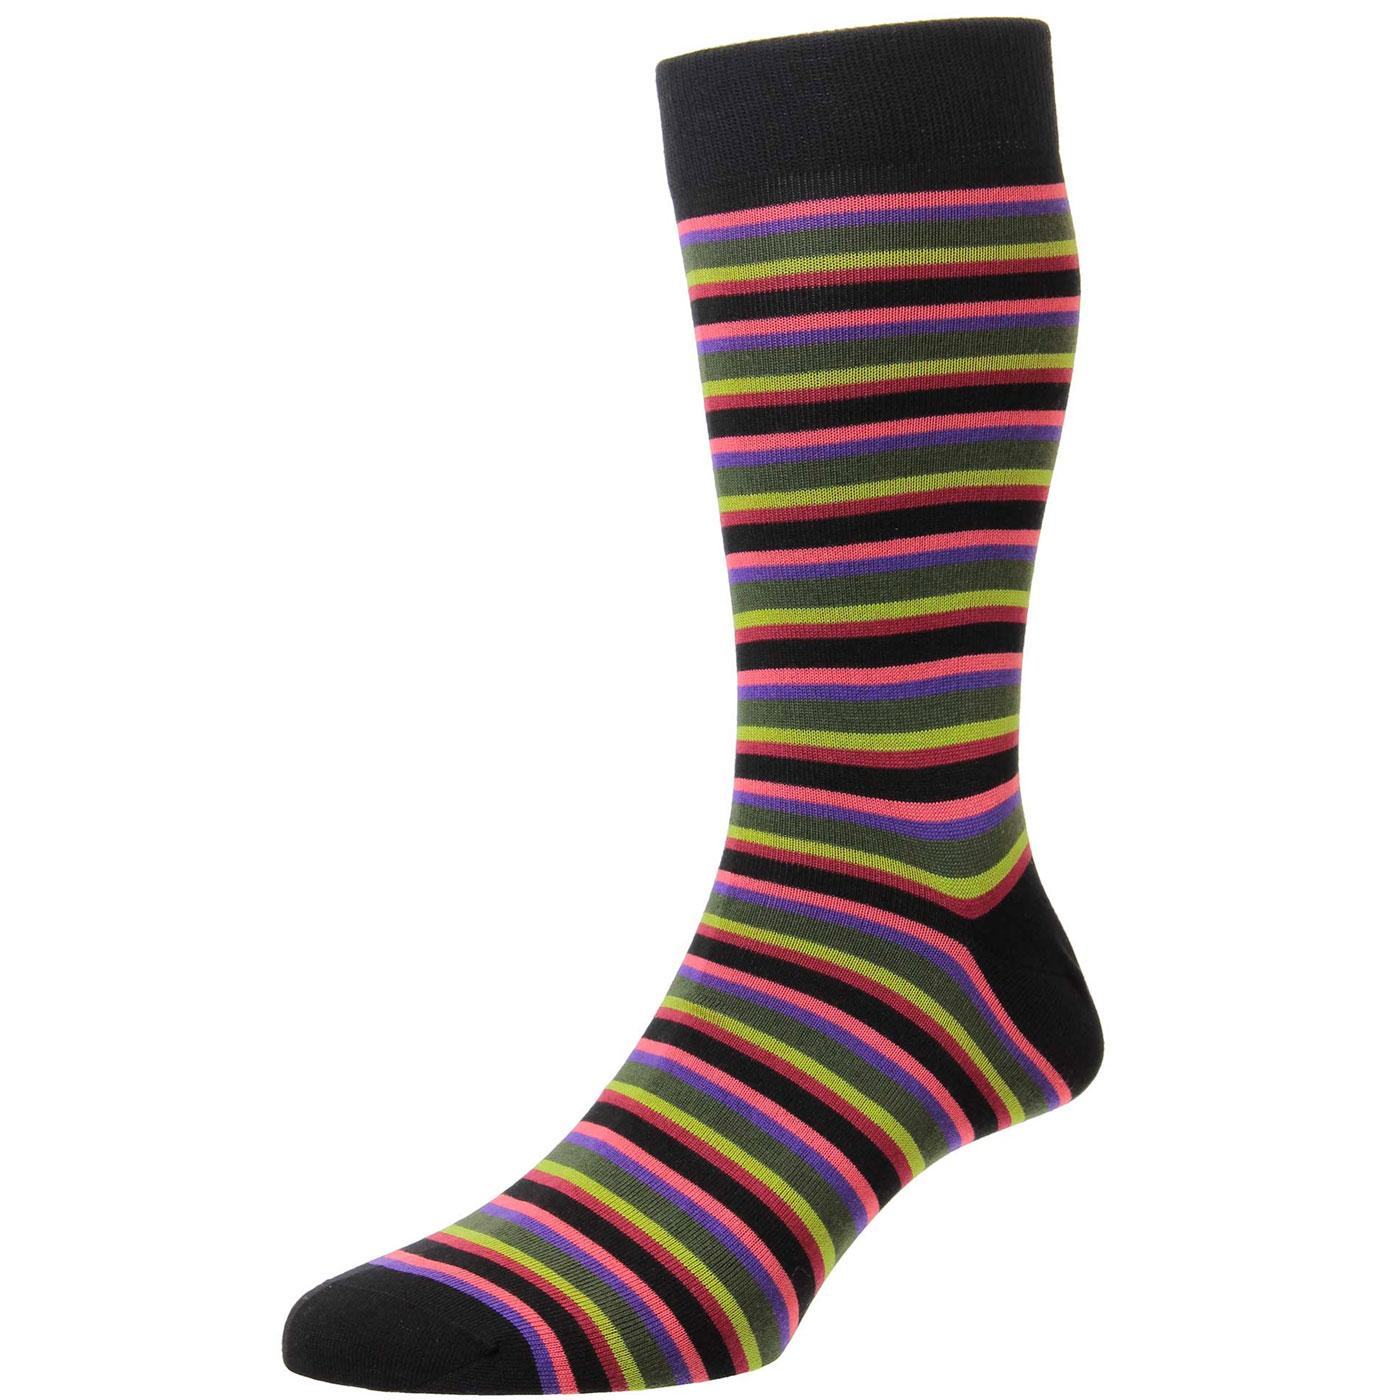 + Meier PANTHERELLA Retro Mod Stripe Socks (BLACK)